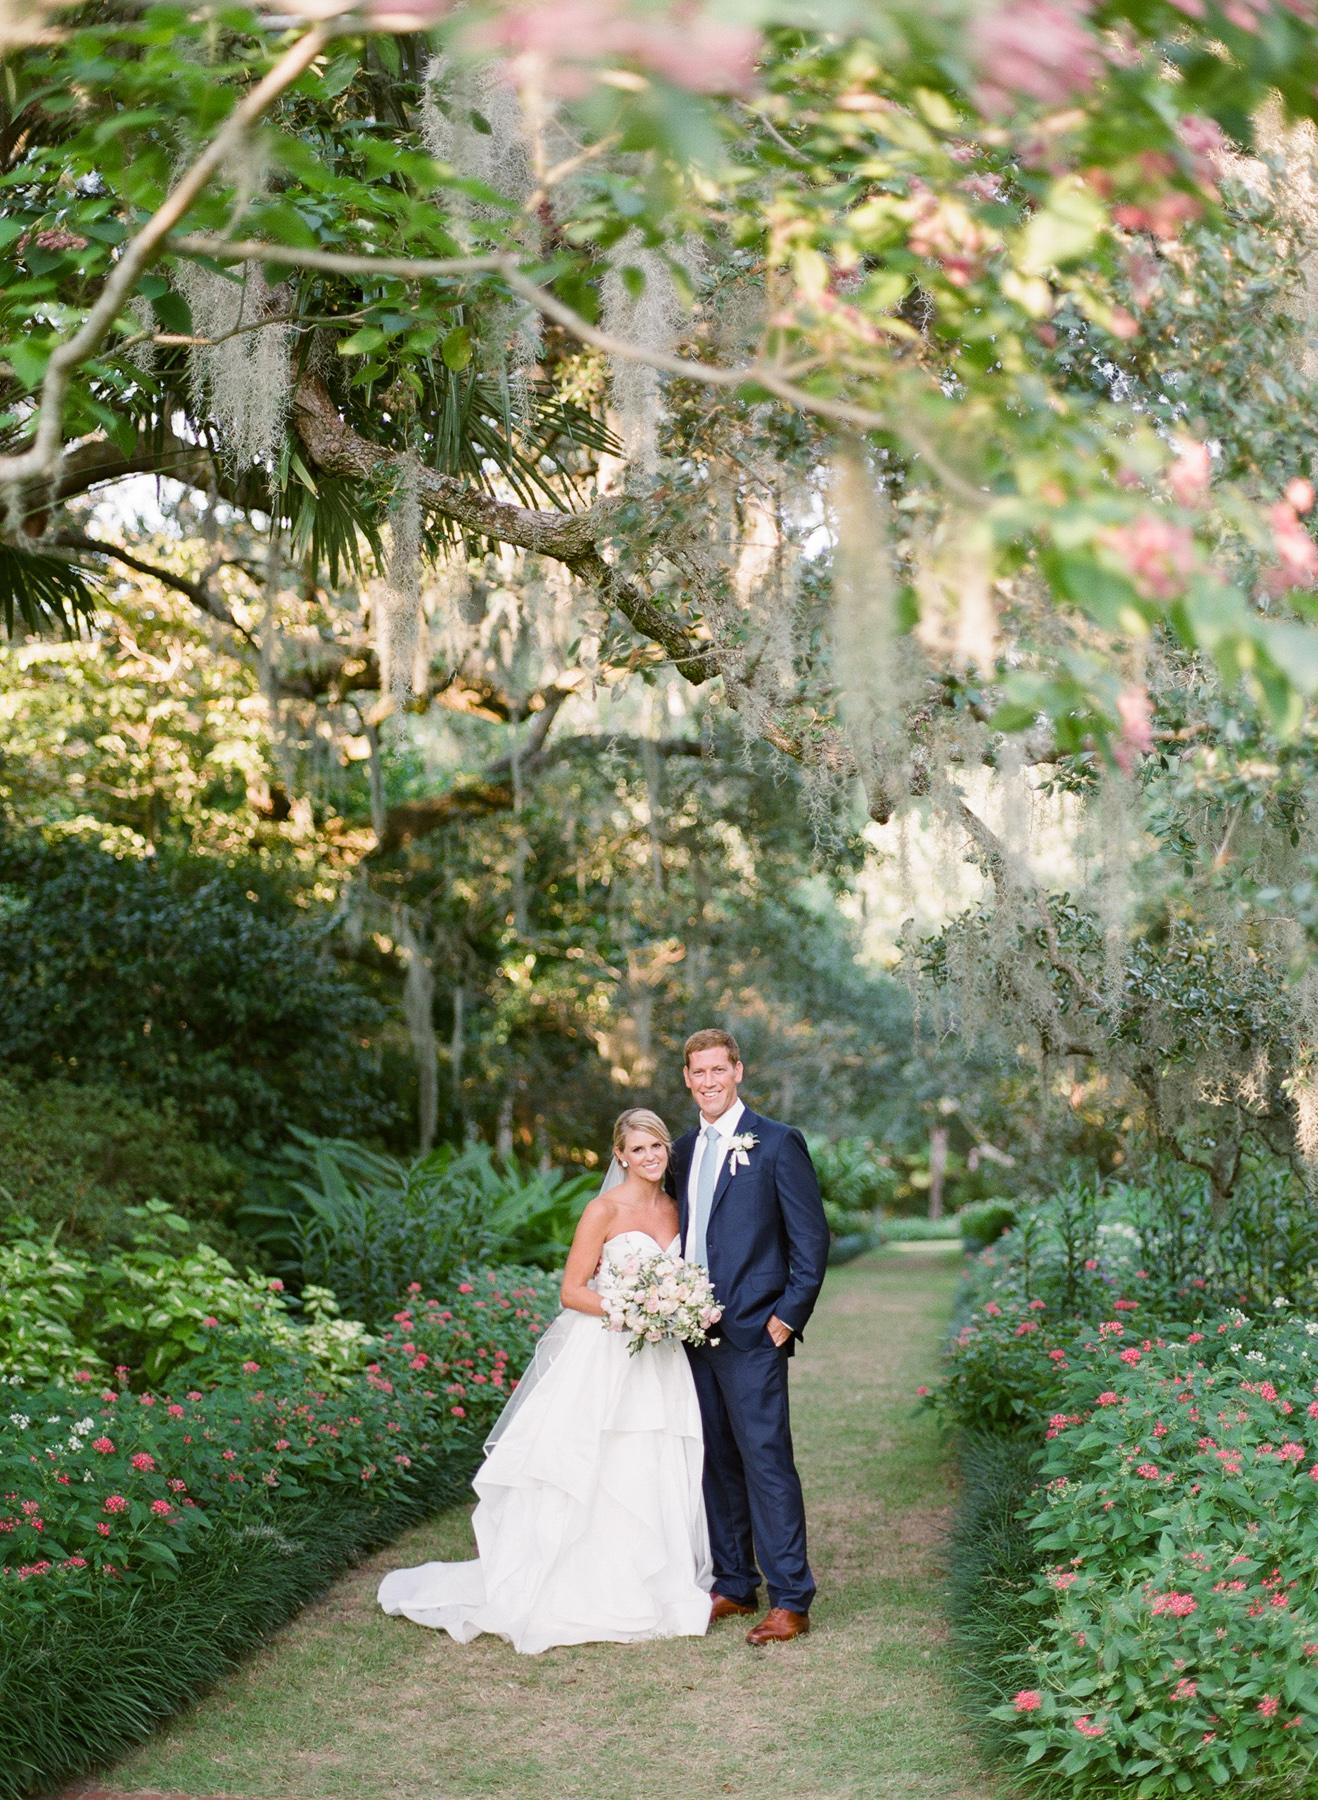 Hilary & Gabe - Airlie Gardens, NC